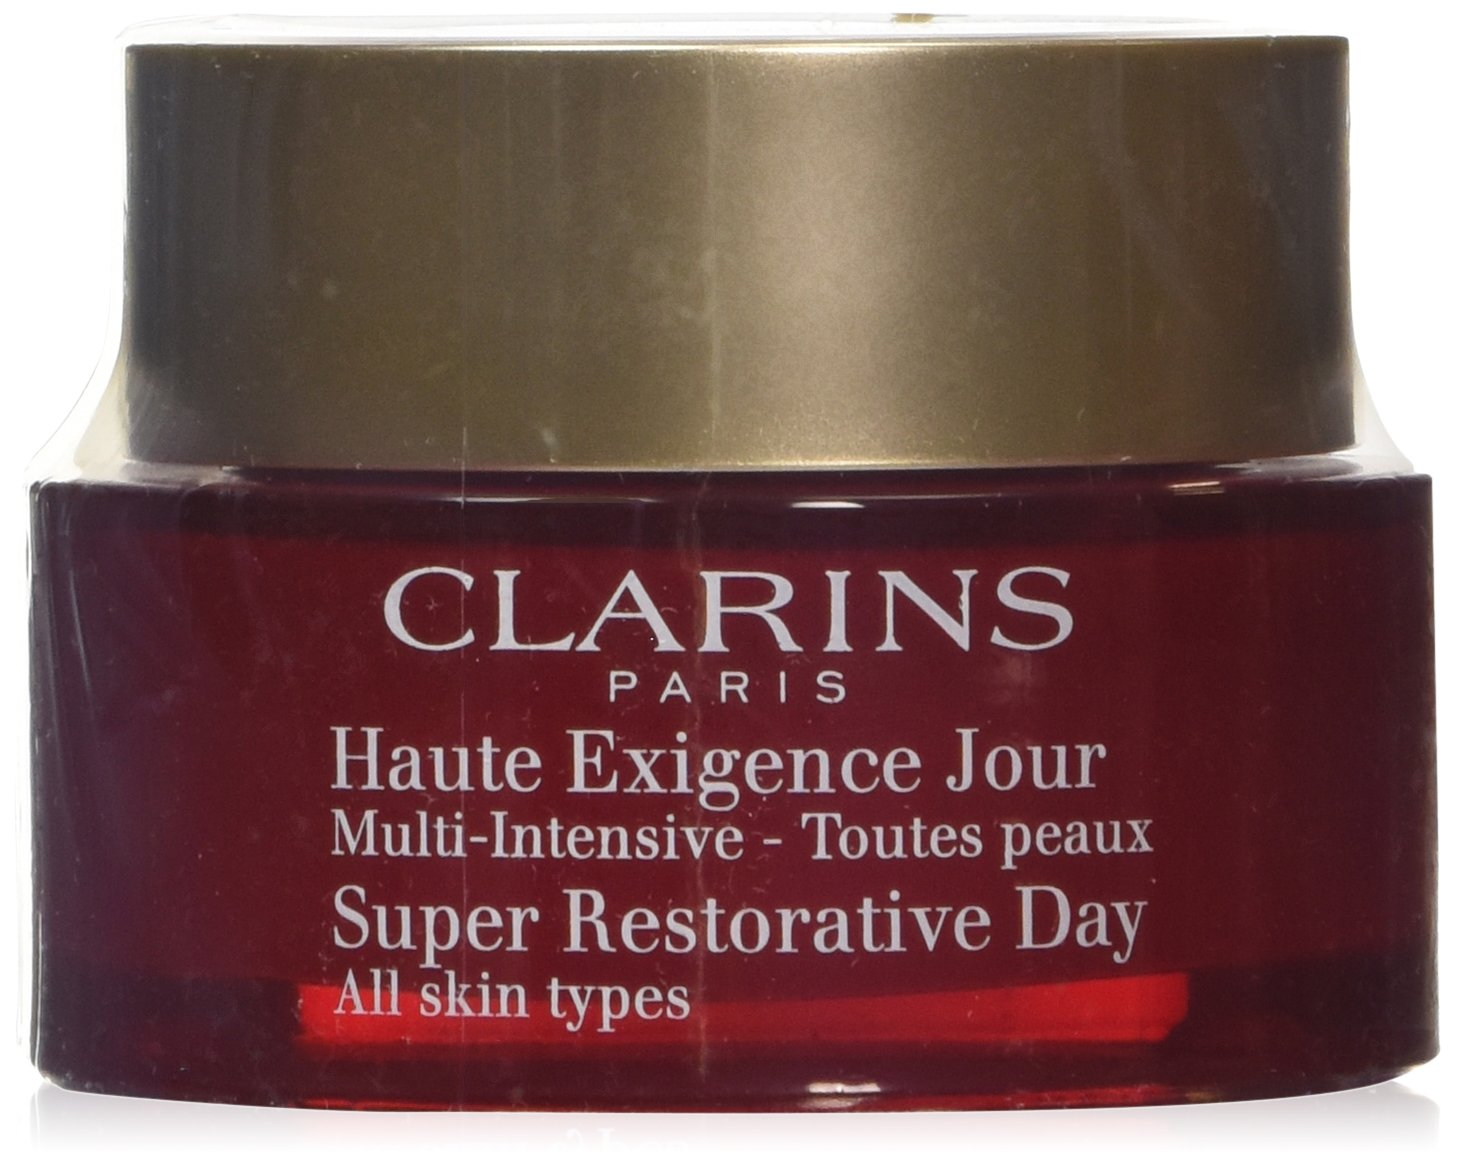 Clarins Super Restorative Day Cream All Skin Types, 50 ml CLA125968 CLA109410